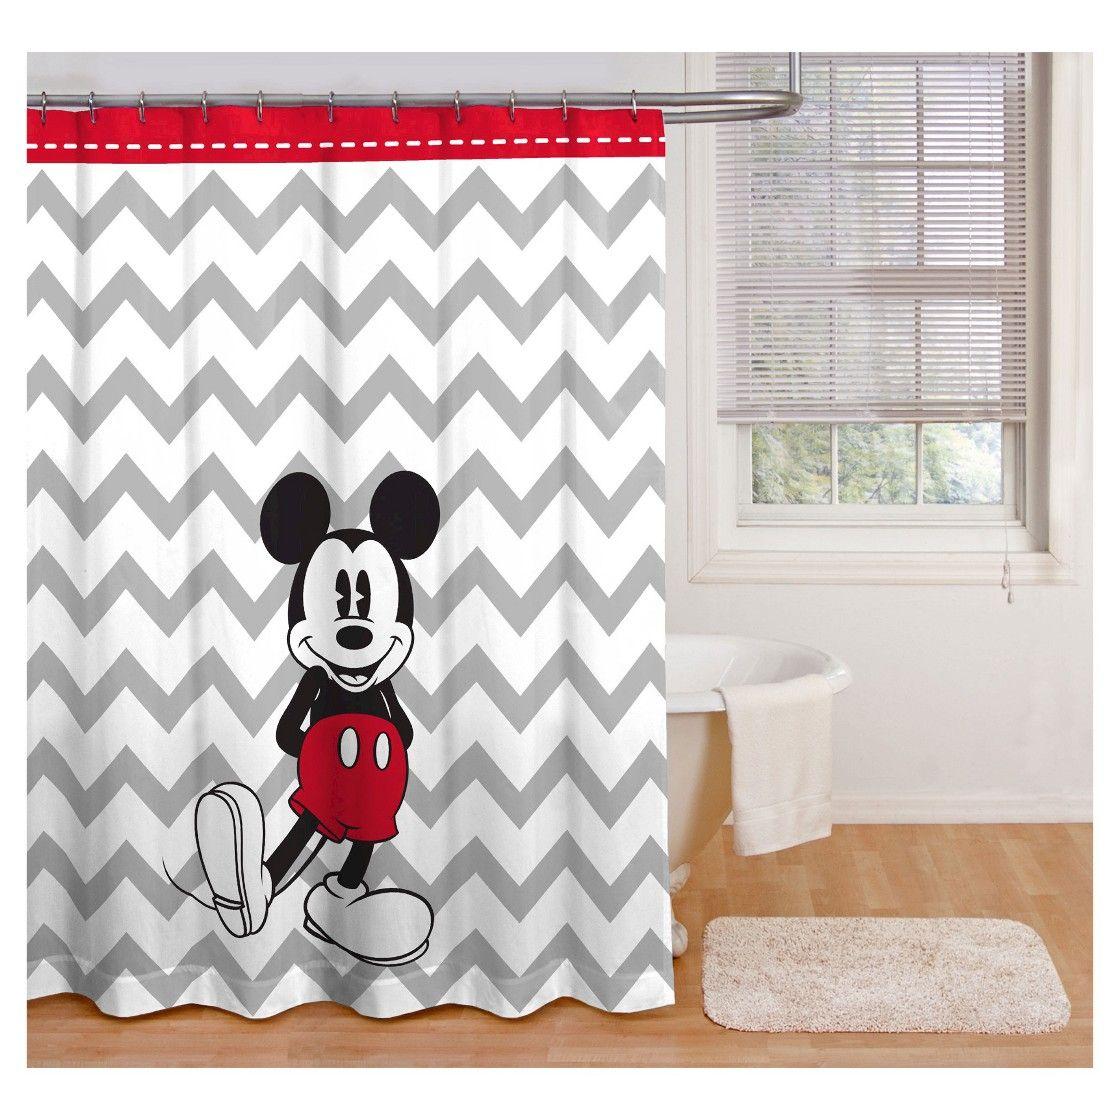 Disney Mickey Mouse Chevron Shower Curtain Gray White Mickey